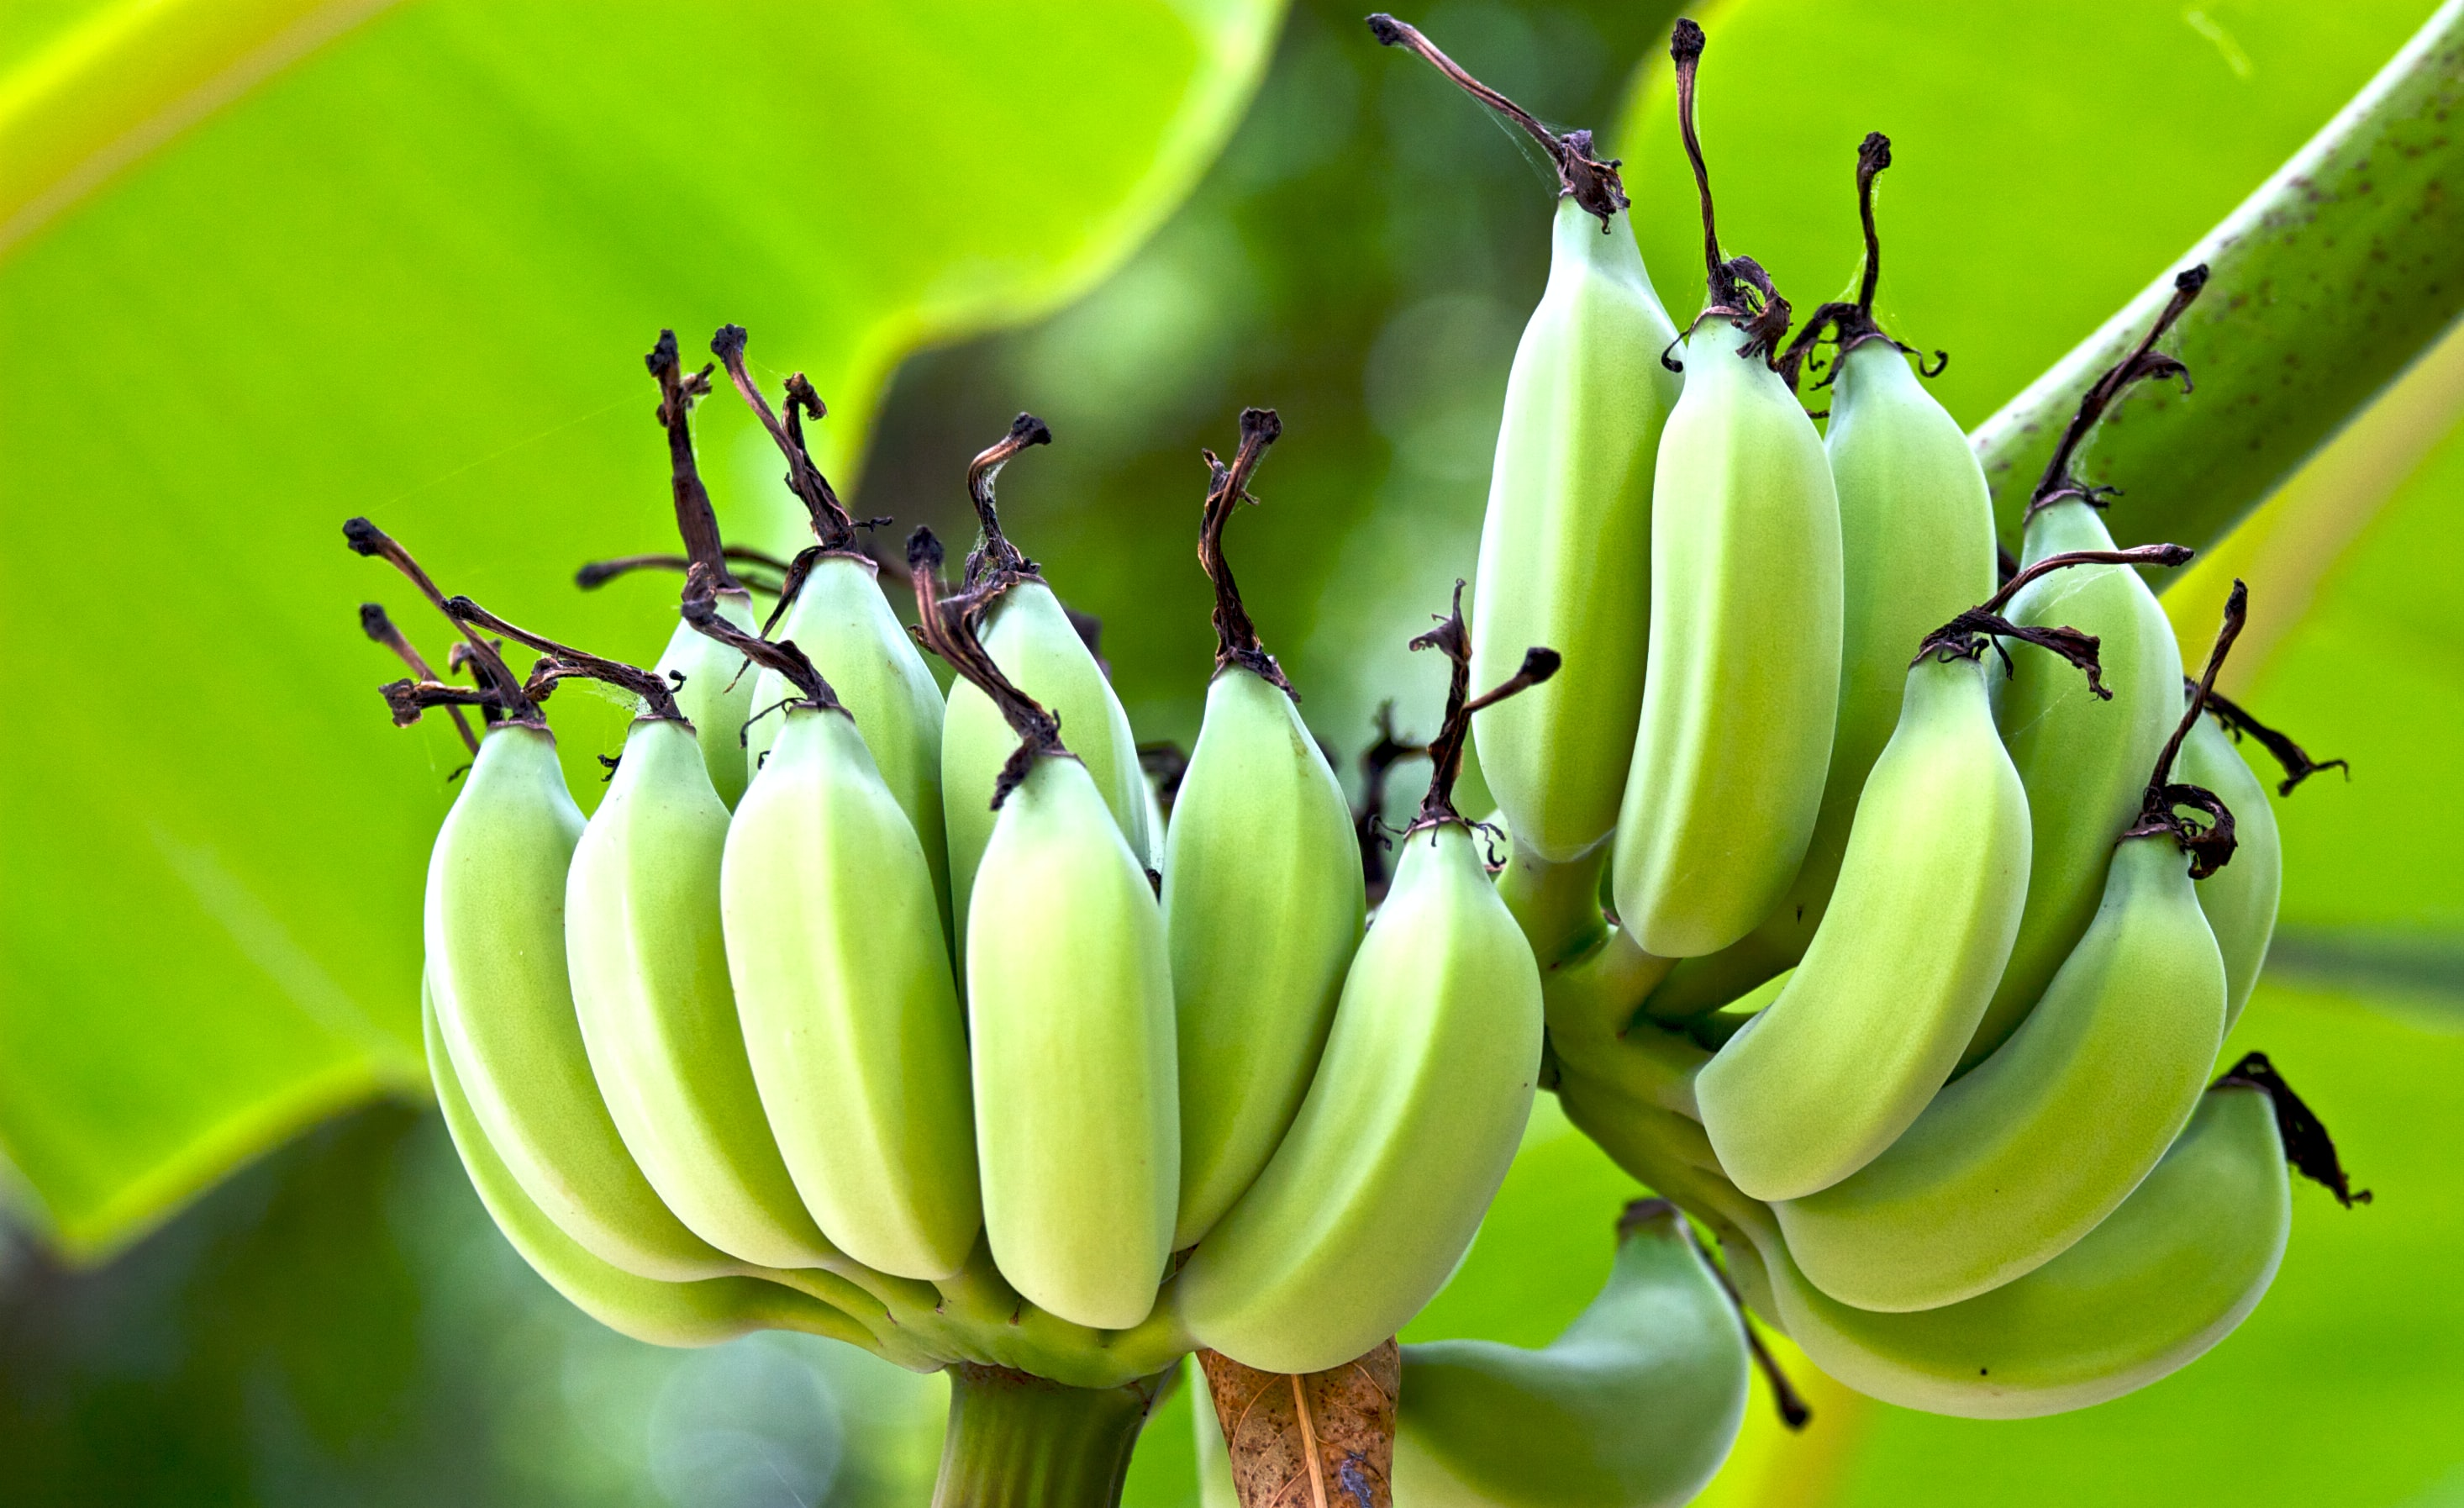 shallow focus photography of banana